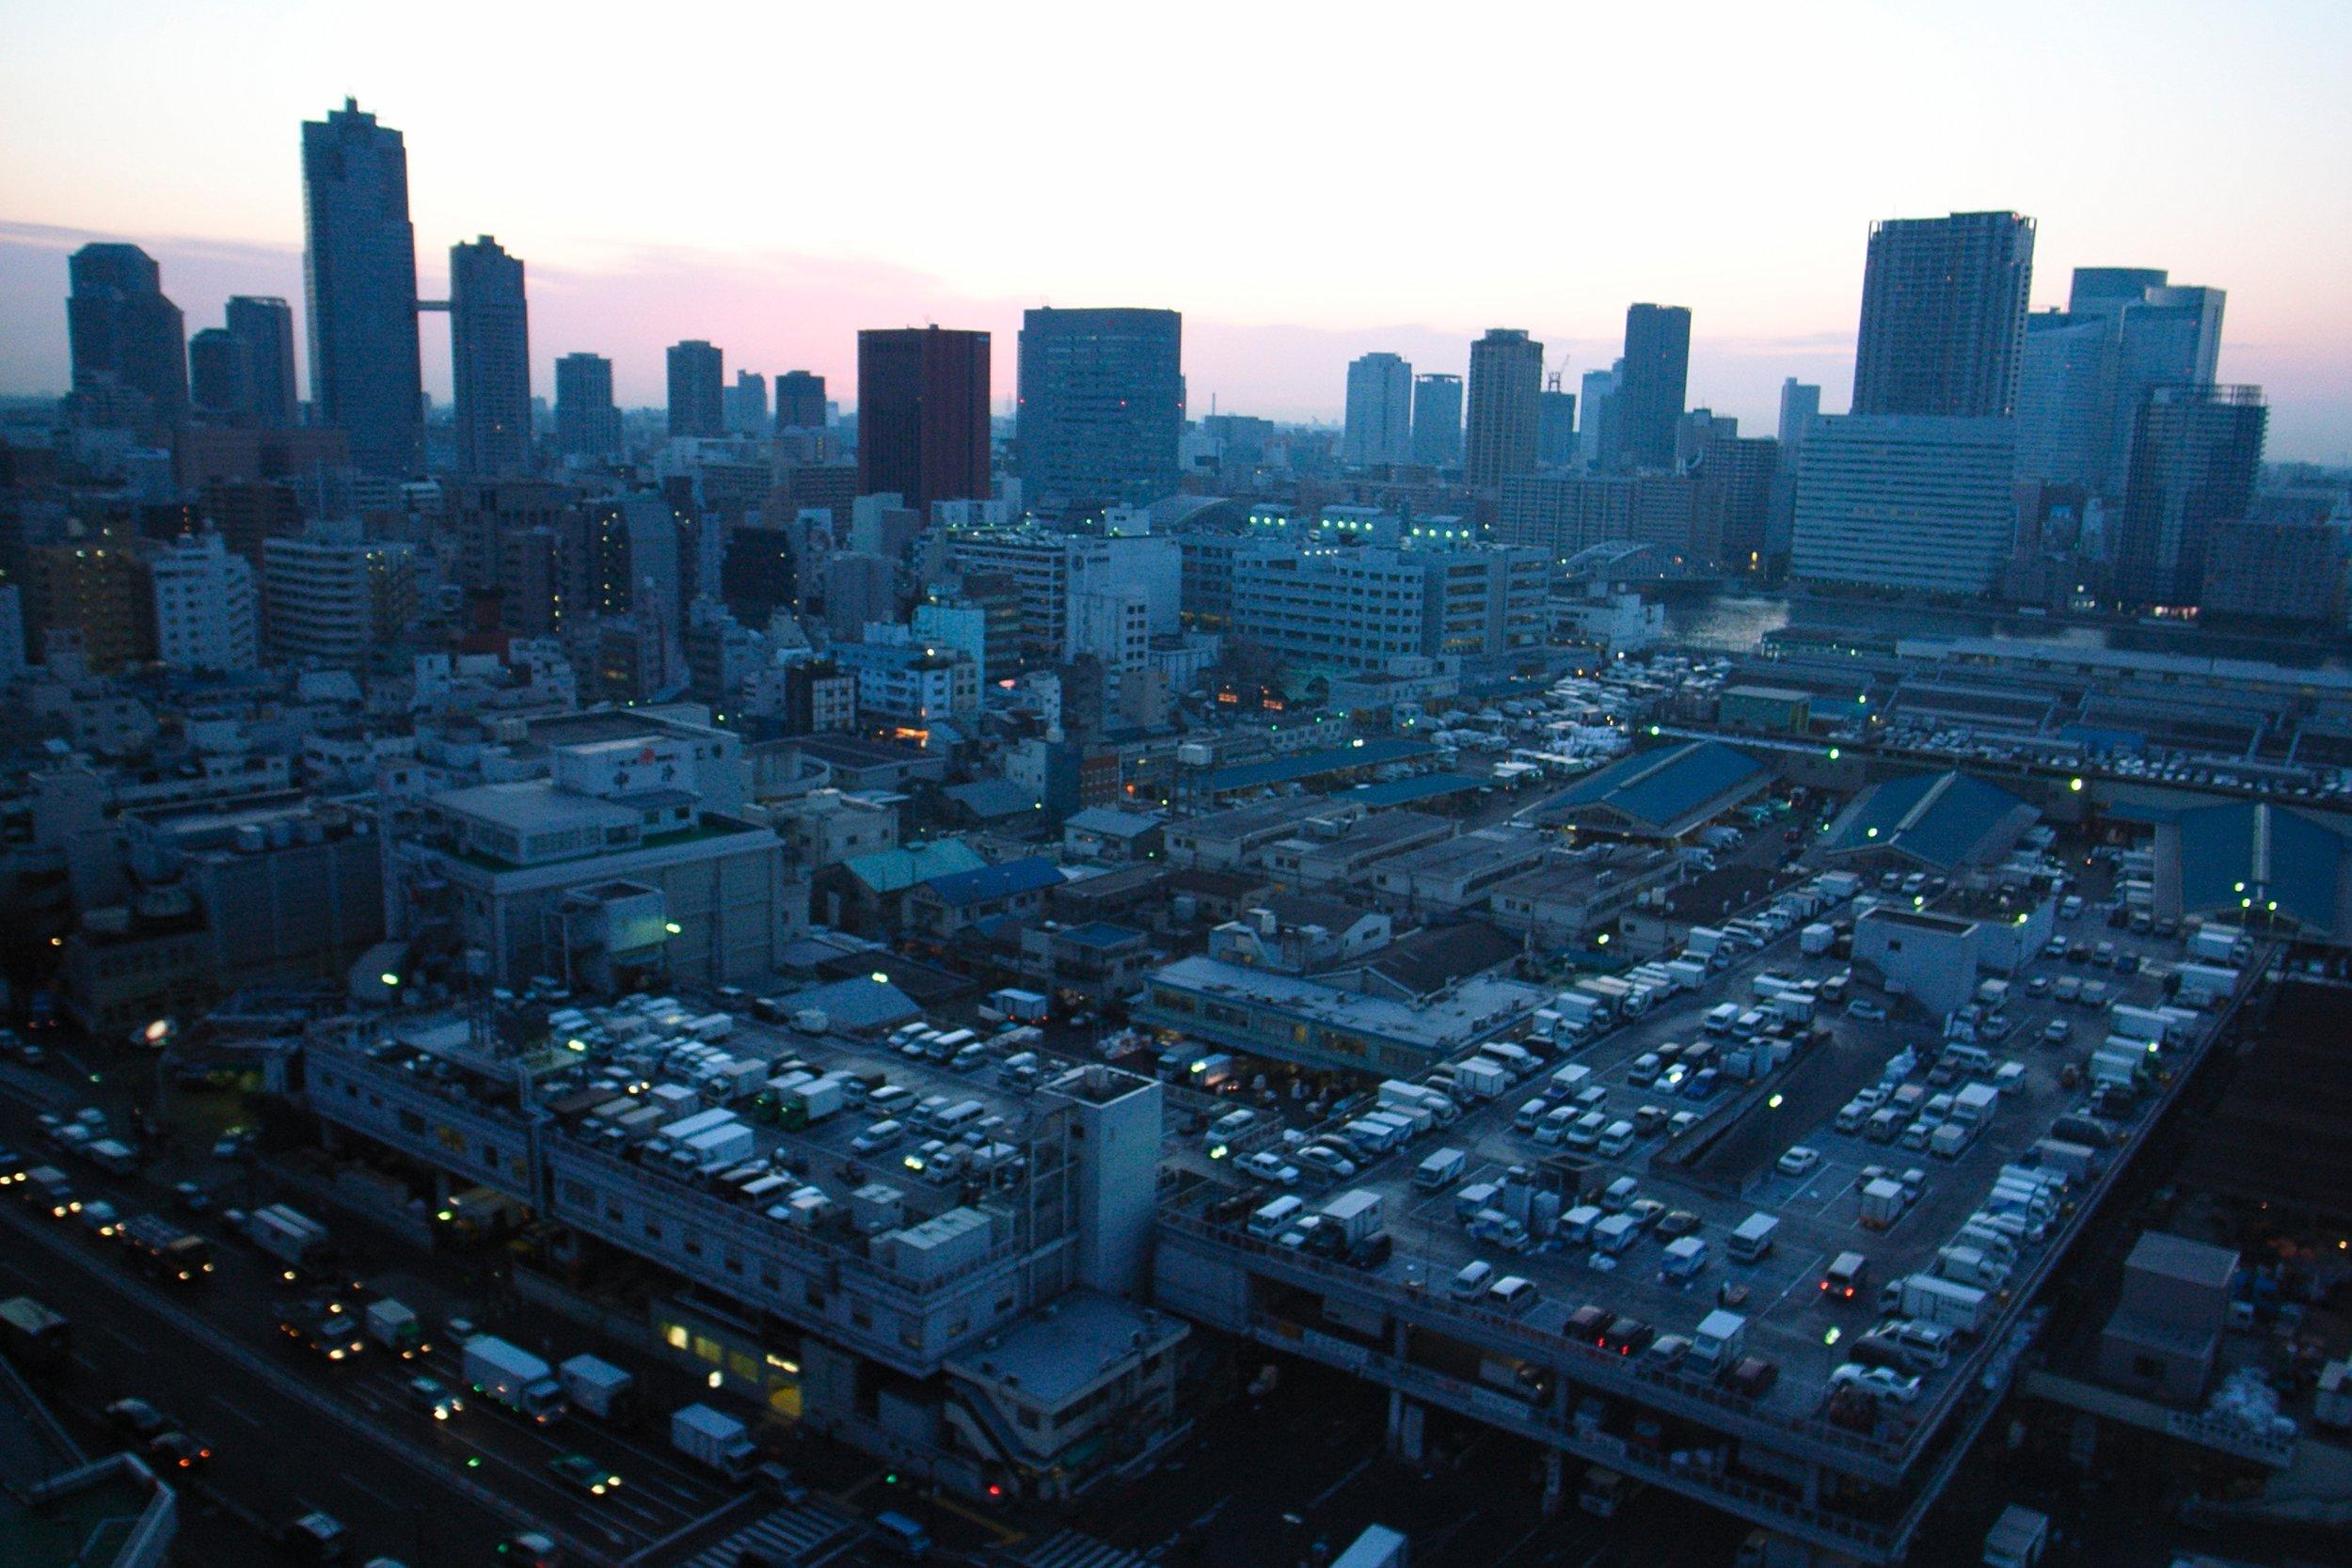 06102019_galeria-tsukiji riquitan.jpg